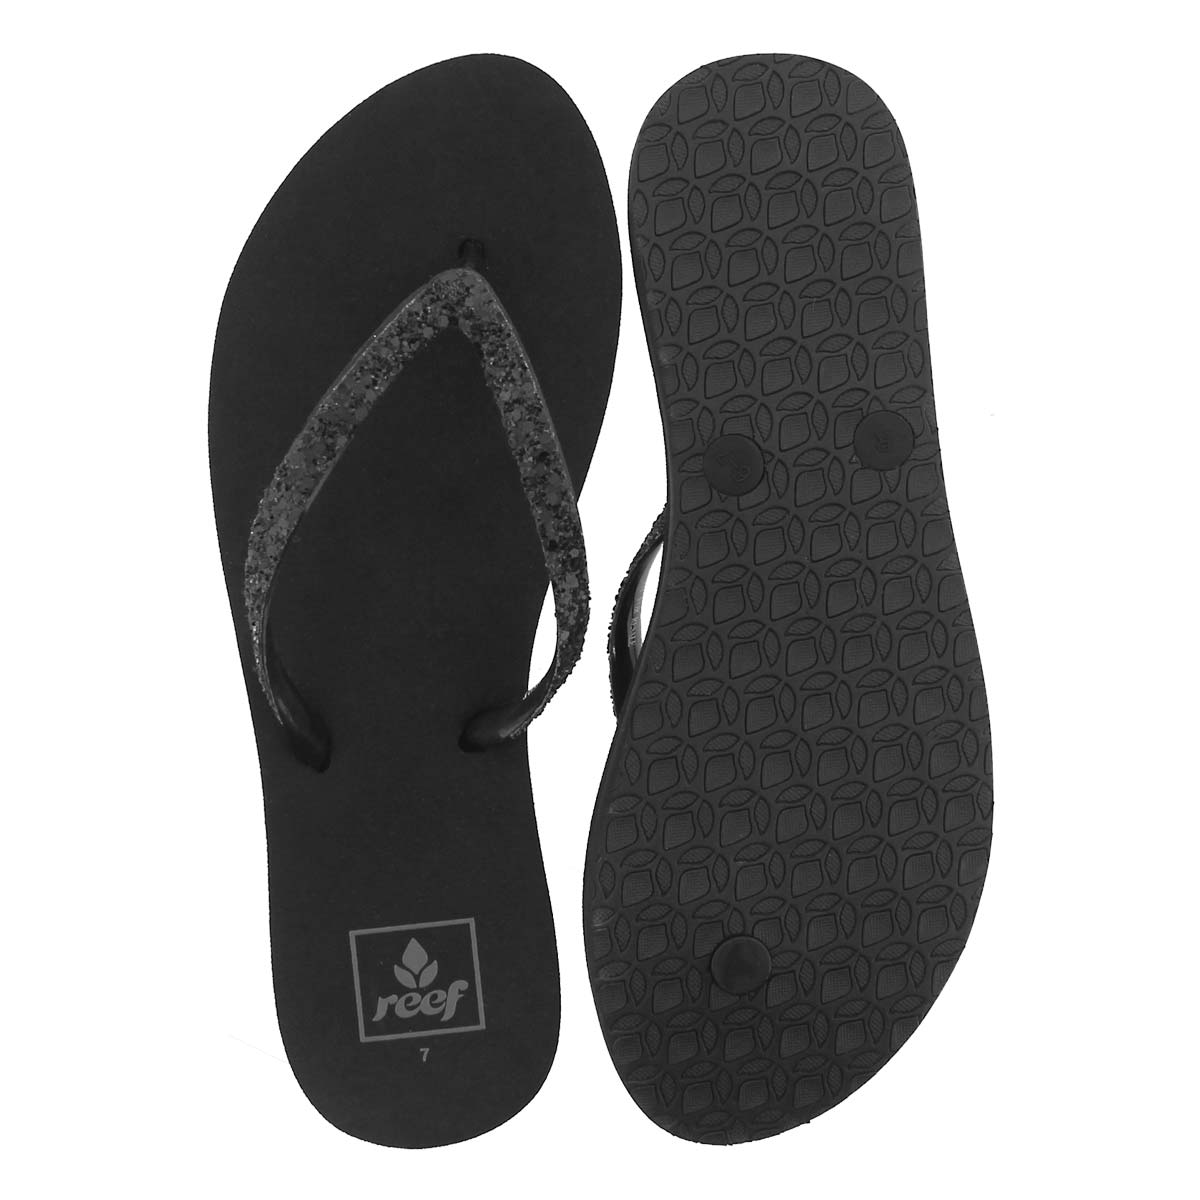 Lds Stargazer black flip flop